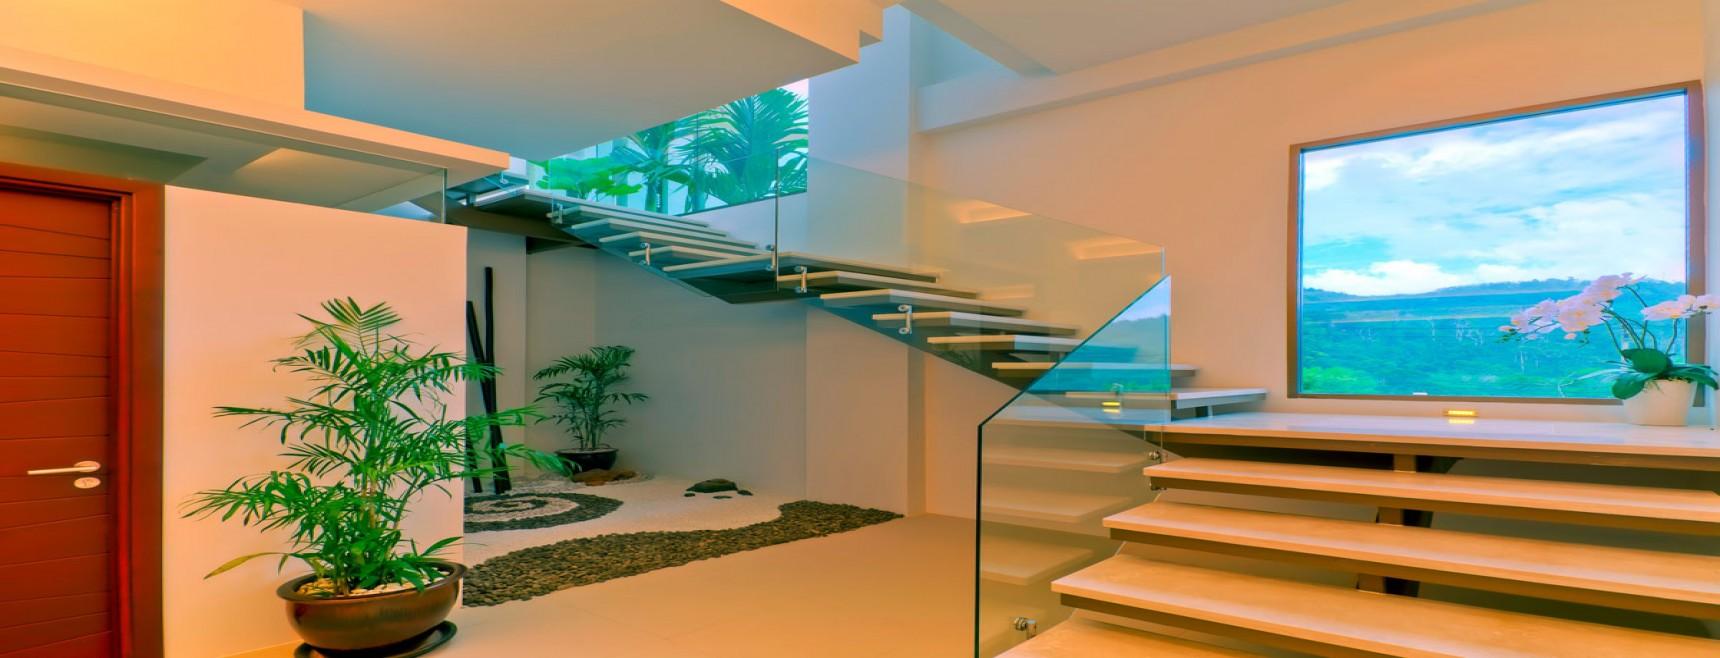 3 Bedrooms, Villa, Residential Sales, 4 Bathrooms, Listing ID 1243, Phuket,